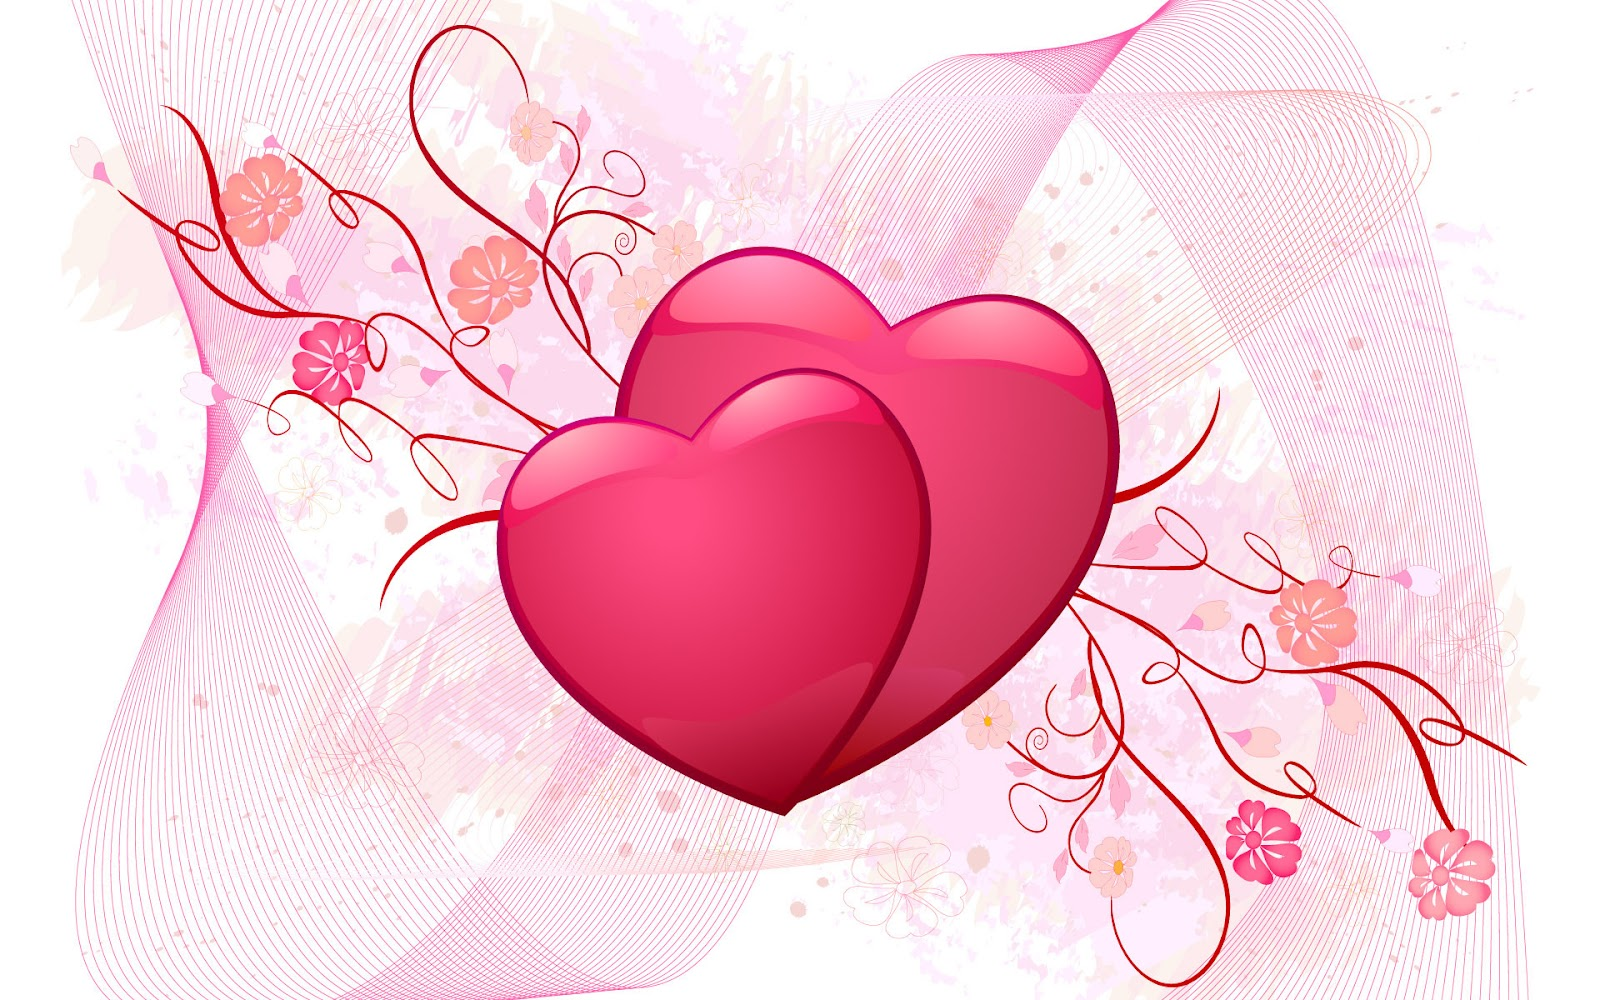 http://3.bp.blogspot.com/-hehftKCNGxY/UBbKhtaJeSI/AAAAAAAAAdA/dGhebQgxS3A/s1600/Love-wallpaper.jpg